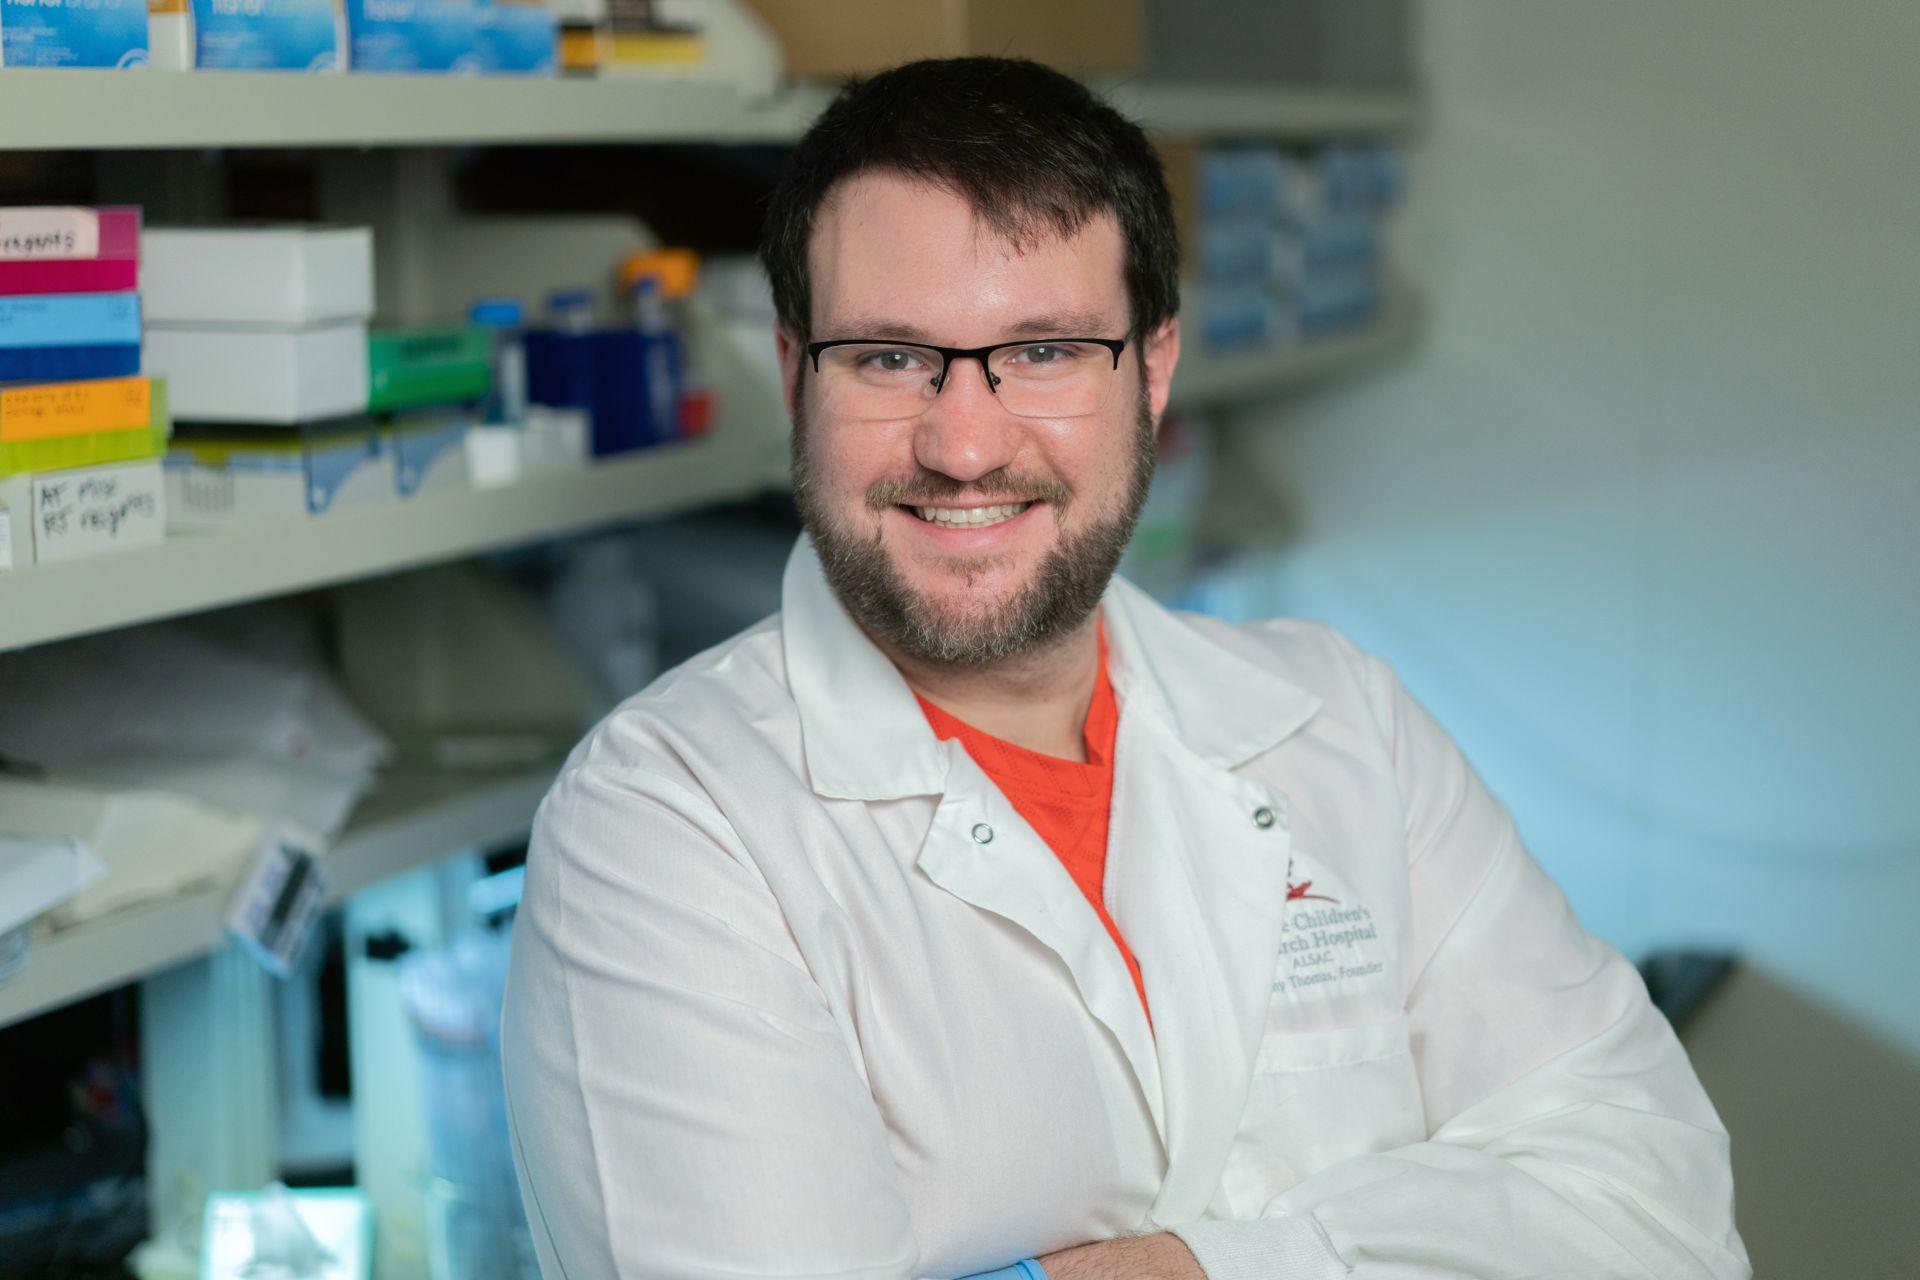 Phil Chapman, PhD